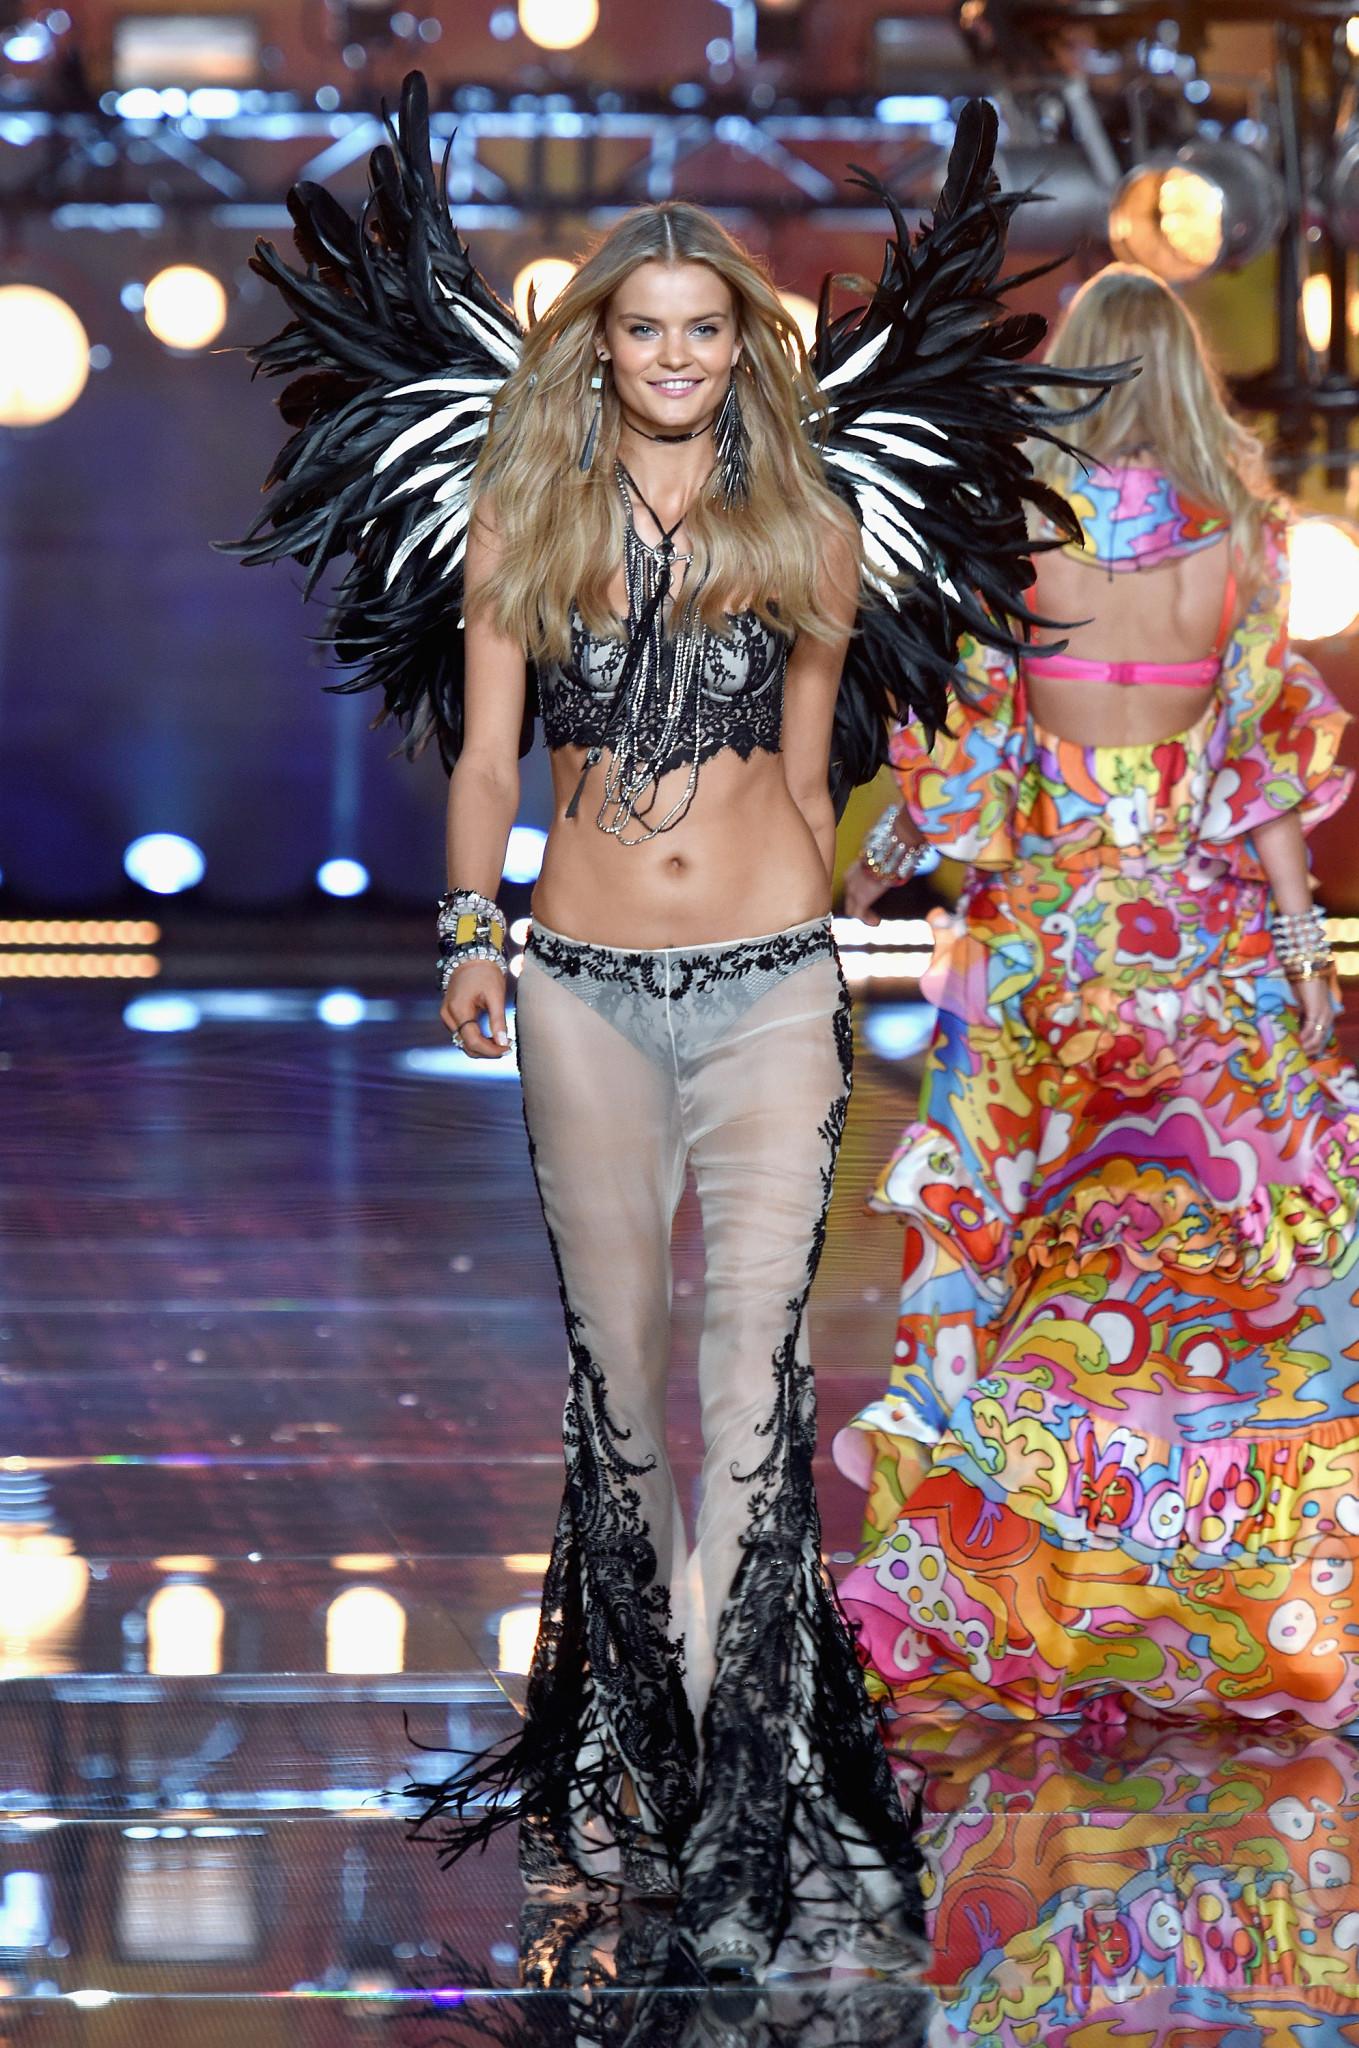 fashion-show-runway-2015-boho-psychadelic-kate-look-14-victorias-secret-hi-res